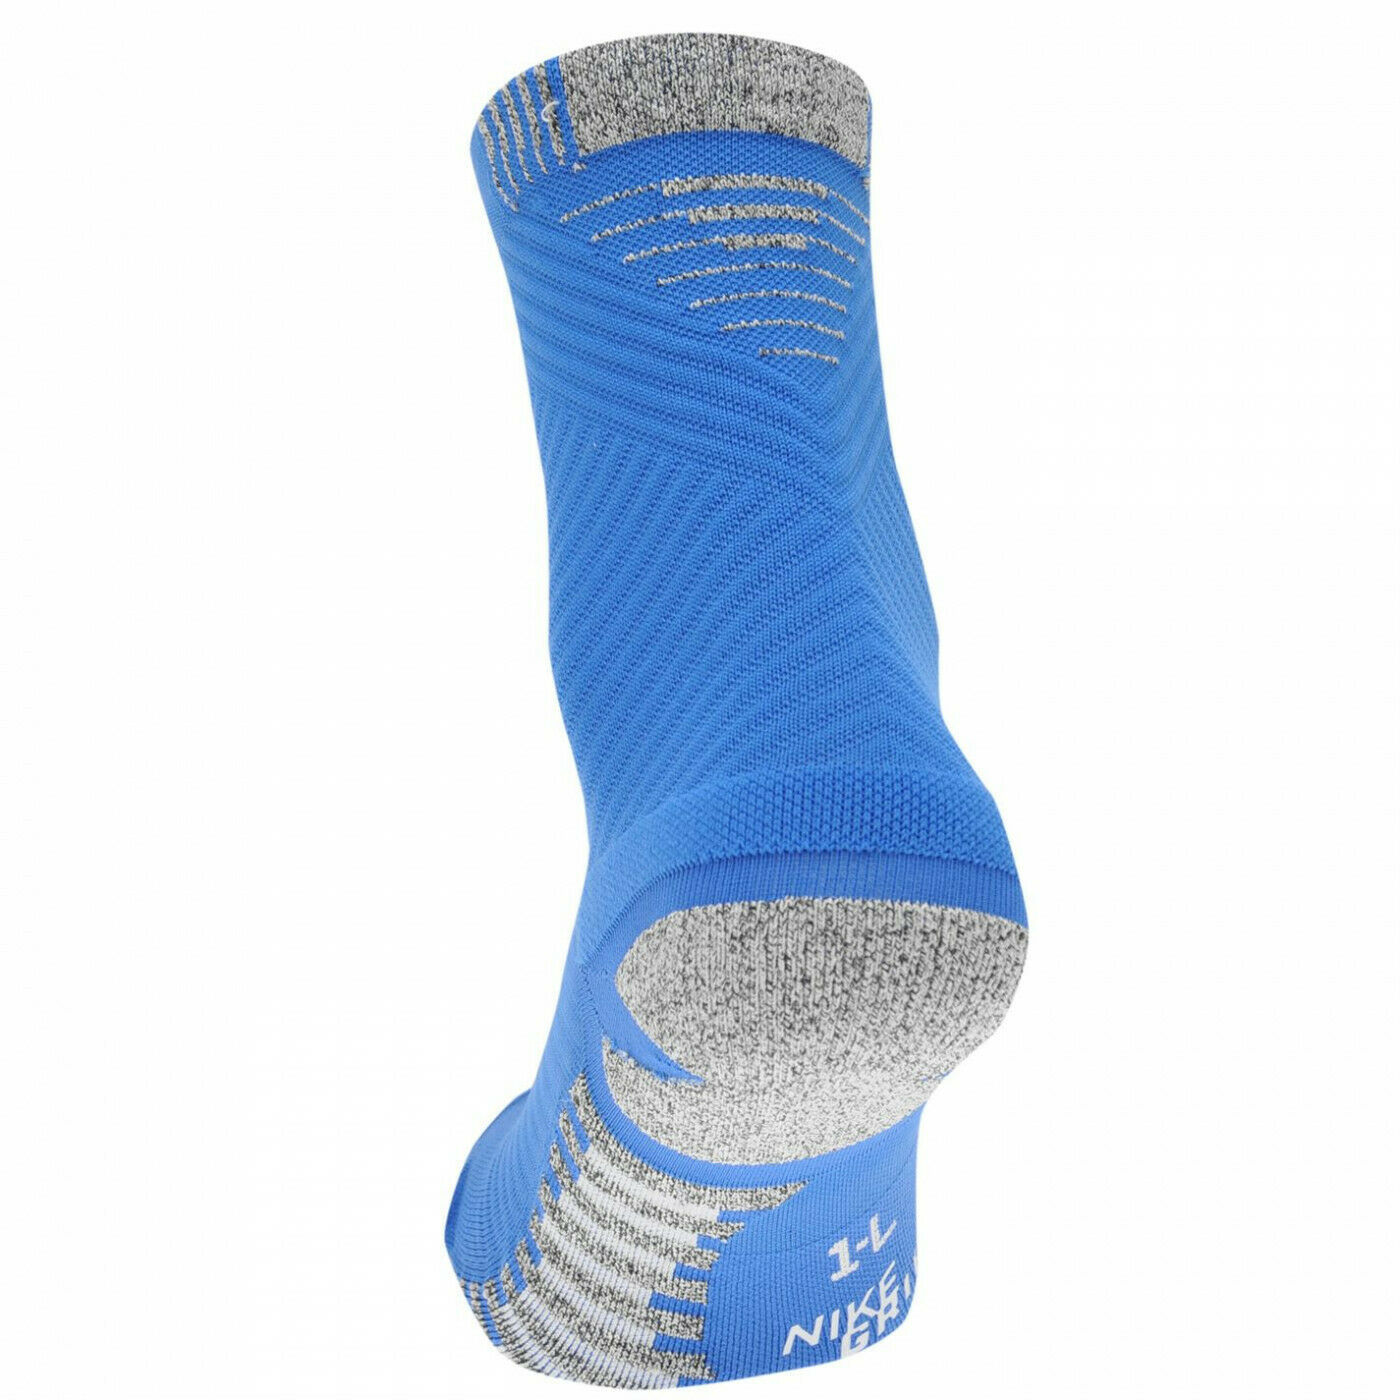 New NIKE Grip STRIKE Light Weight Football Crew Socks  USsz:10-11.5  SX5486-406